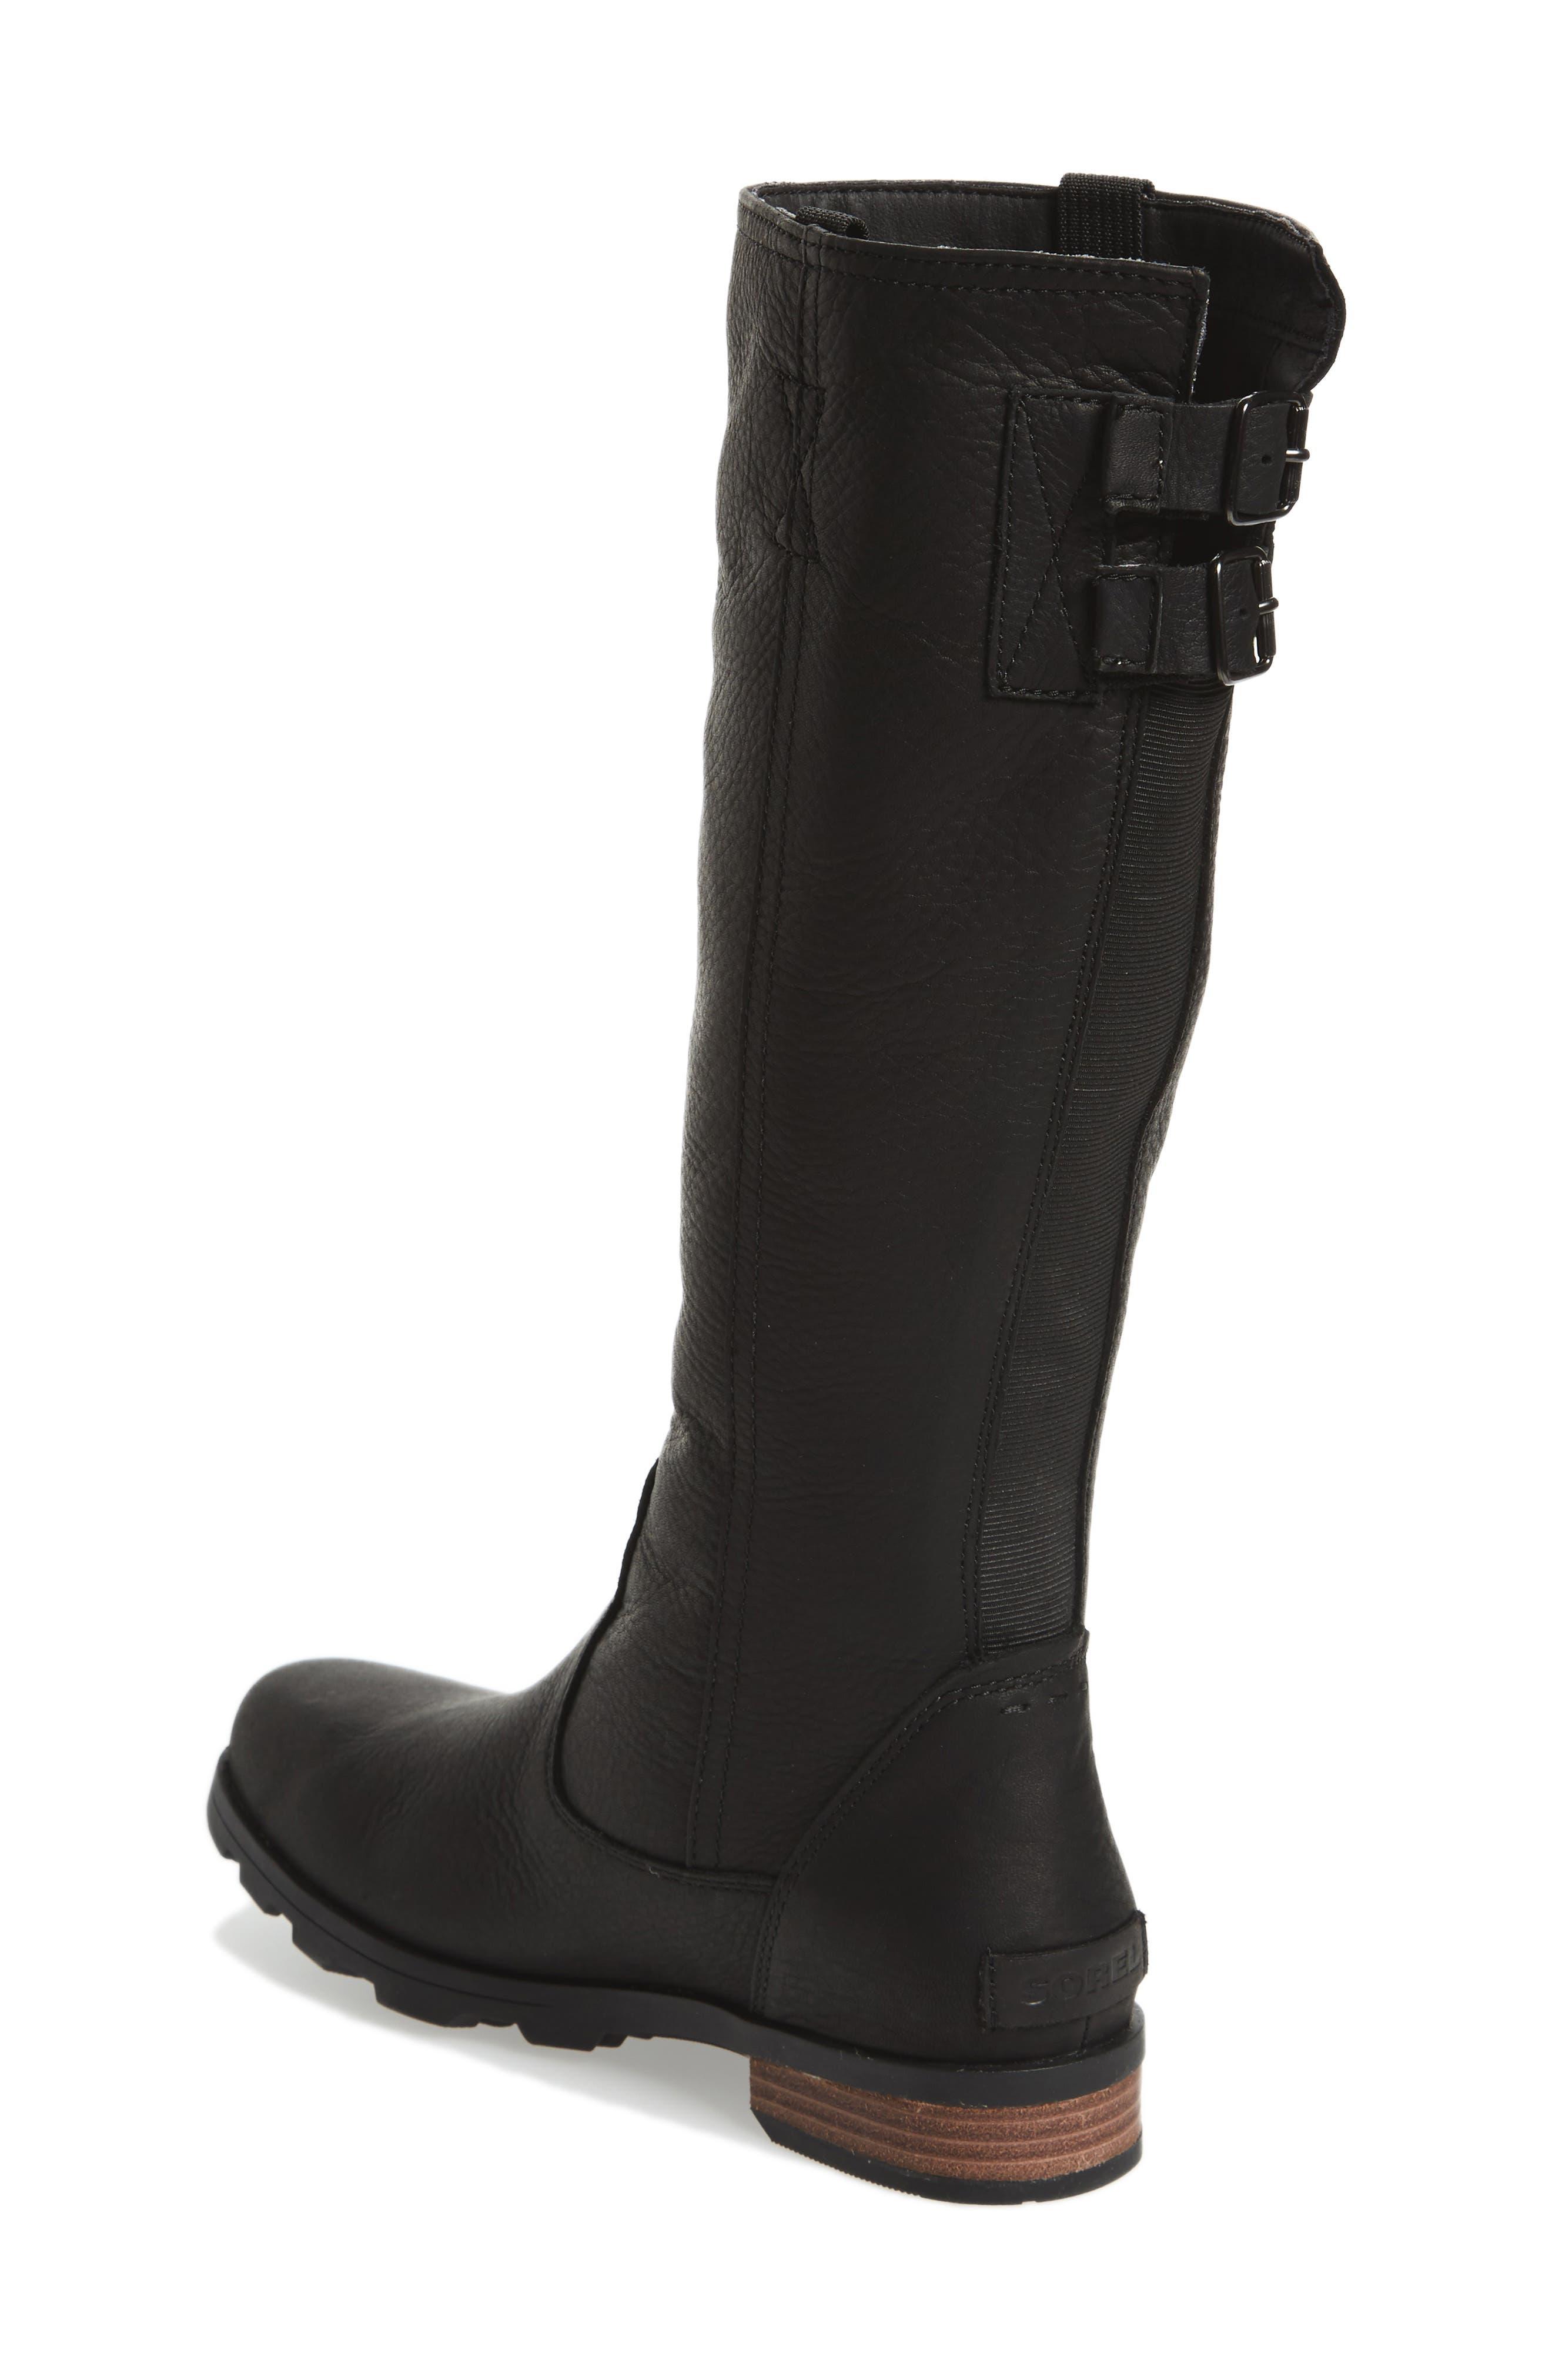 Alternate Image 2  - SOREL Emelie Premium Knee High Boot (Women)